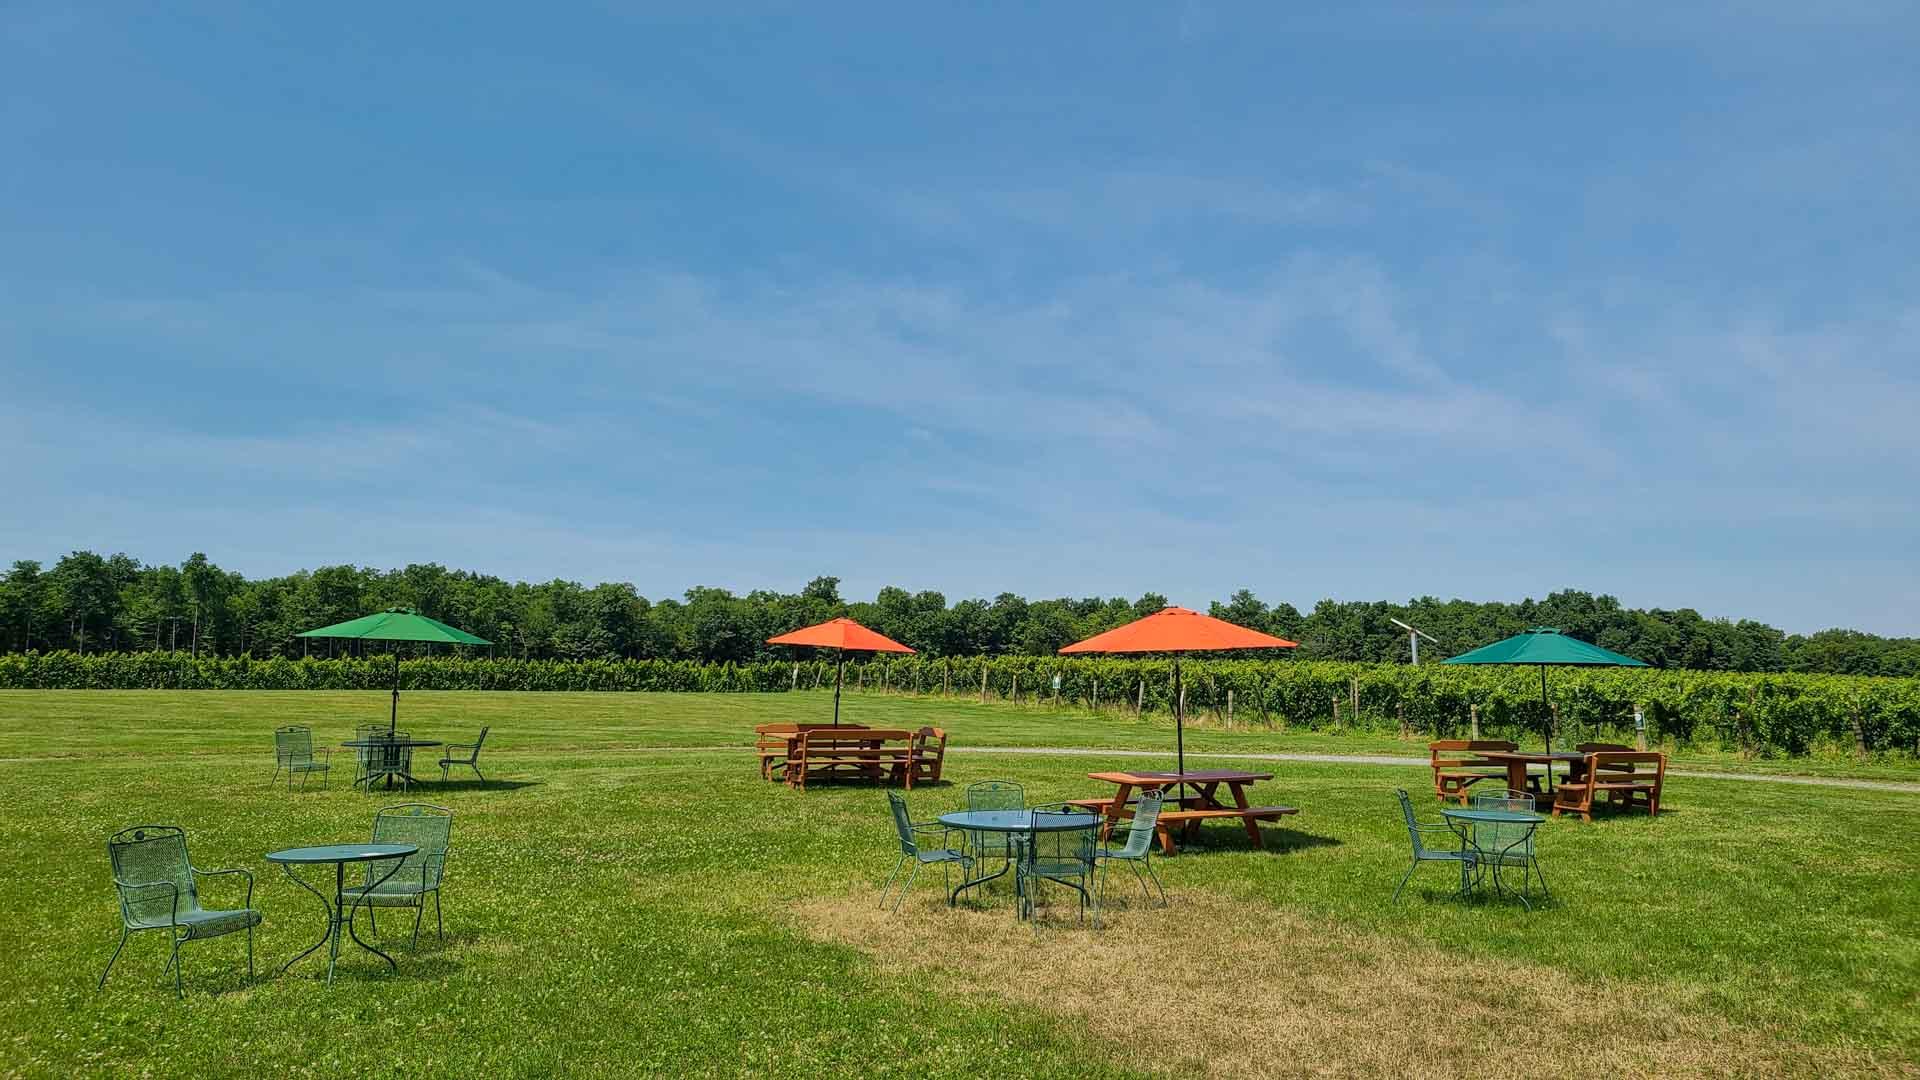 Viñedos en Seneca Lake Wine Trail, Finger Lakes, Nueva York